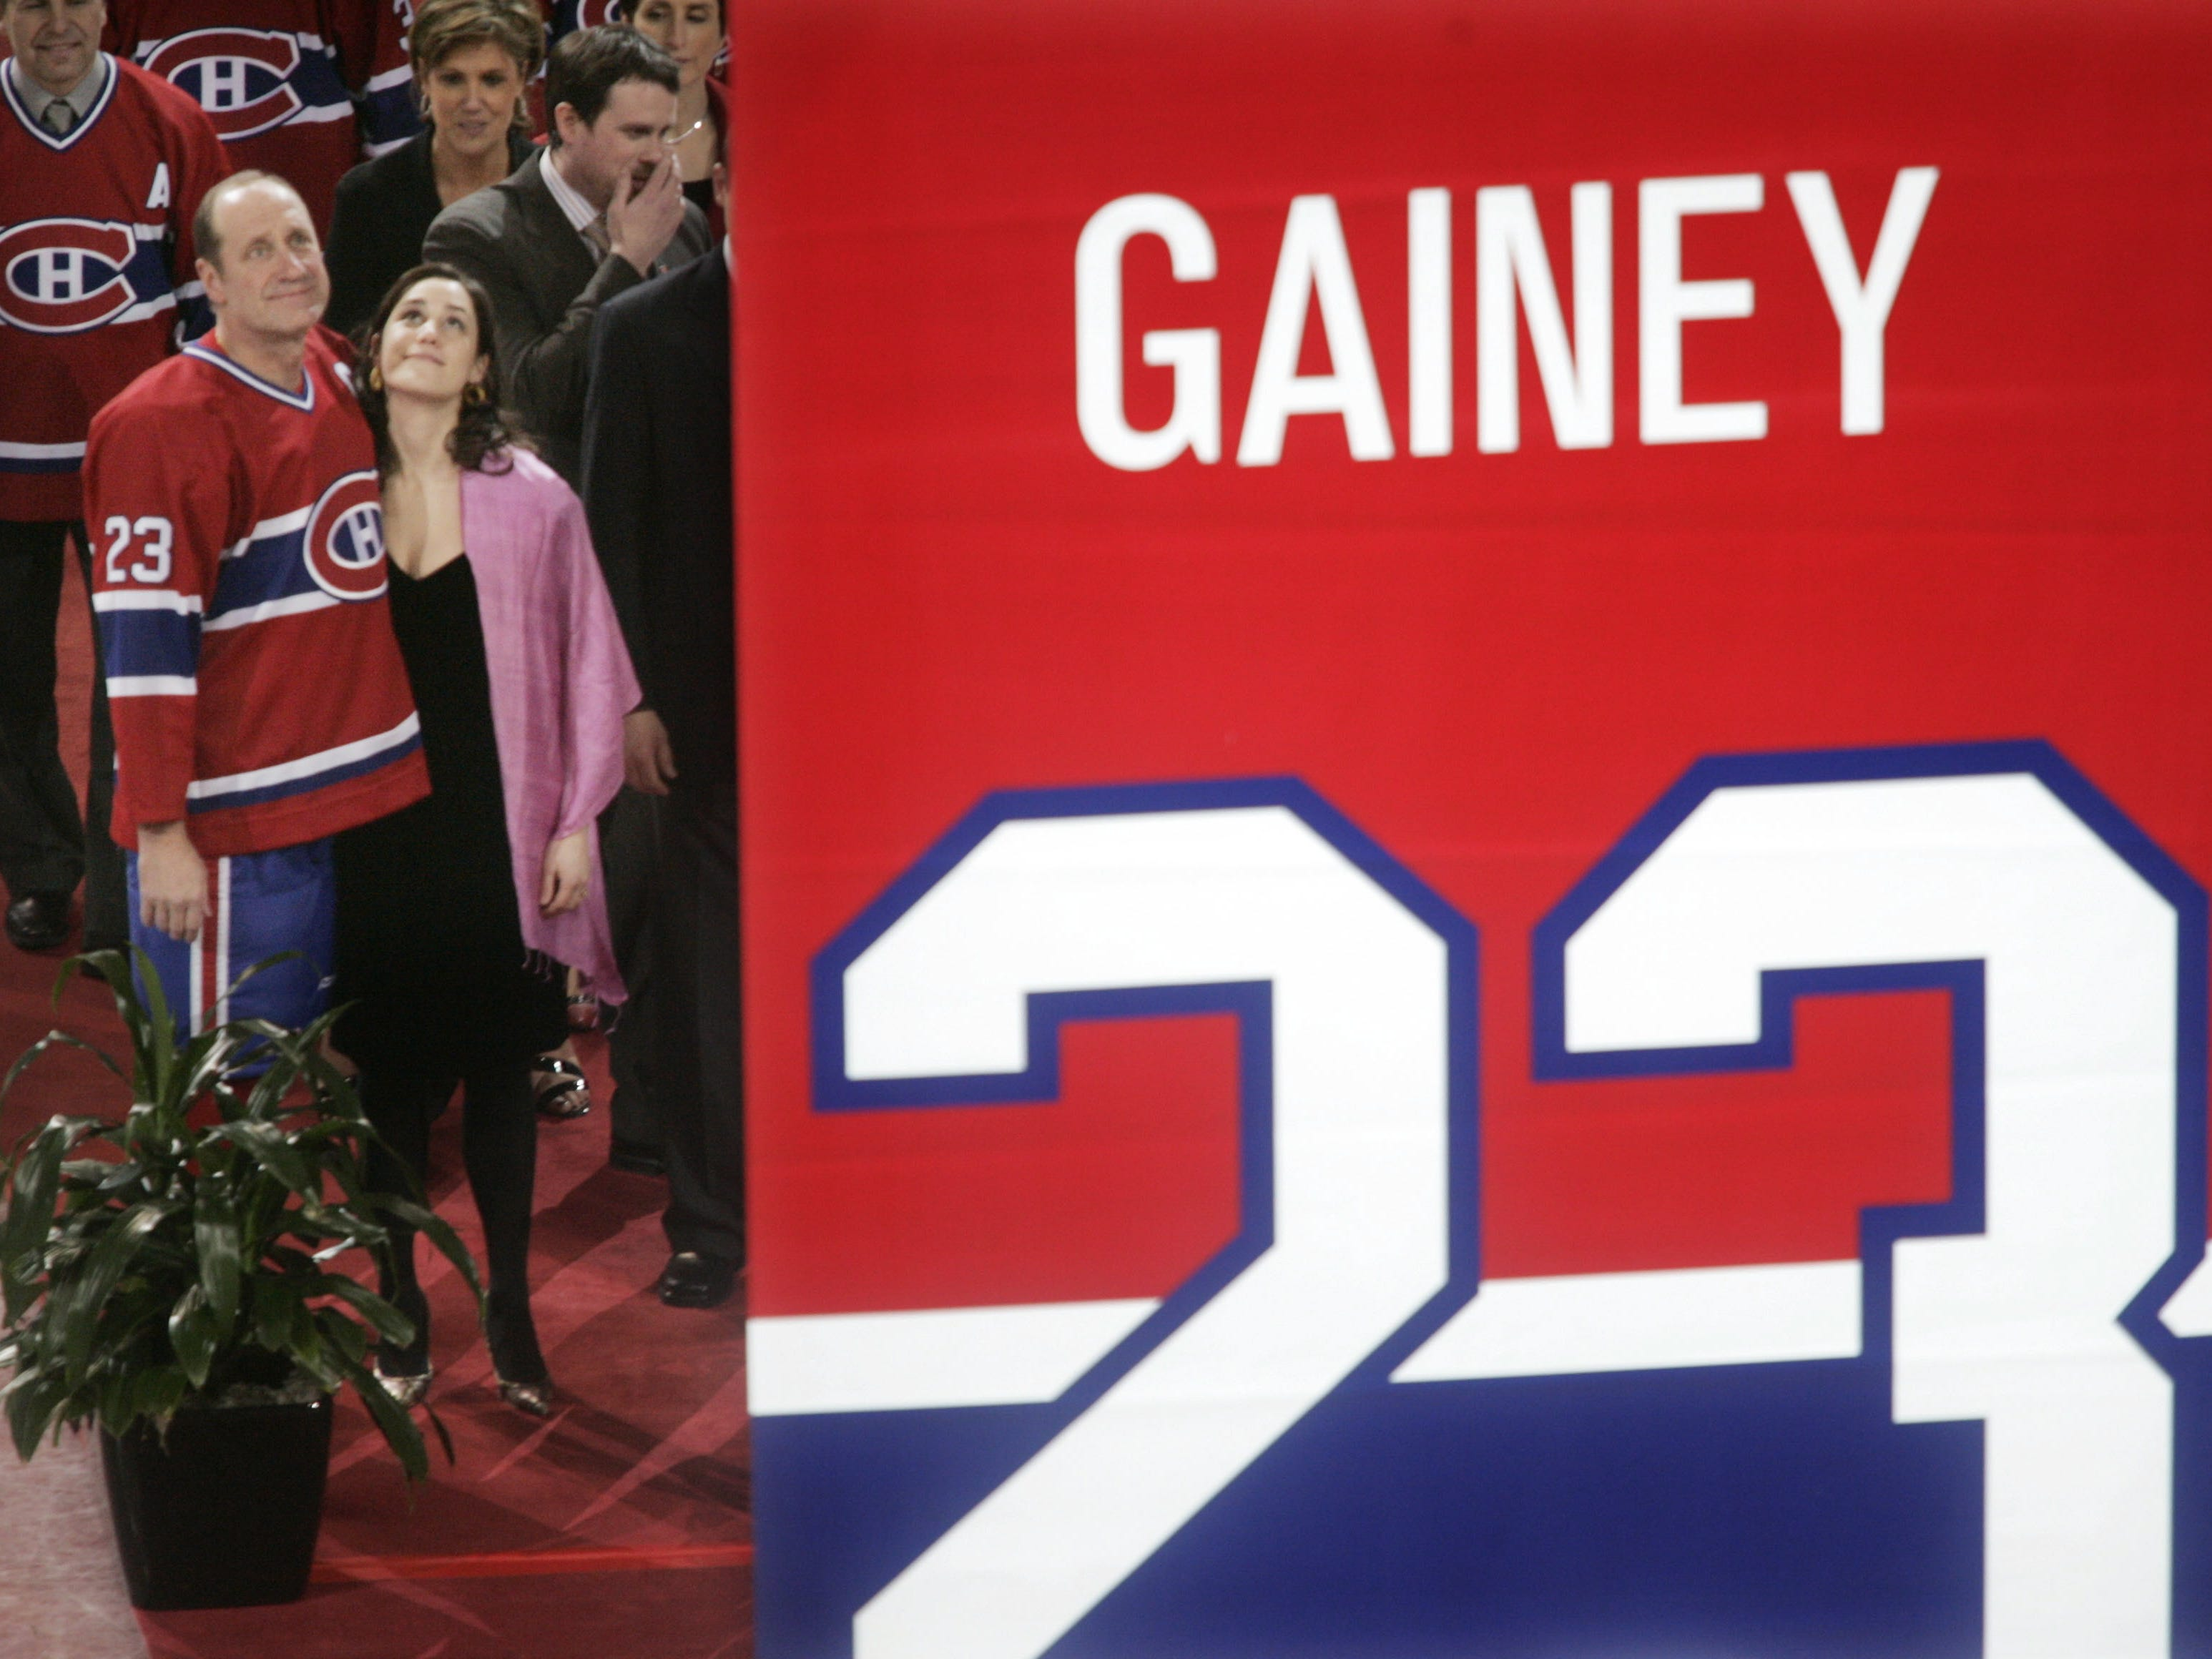 23. Bob Gainey (1973-89)